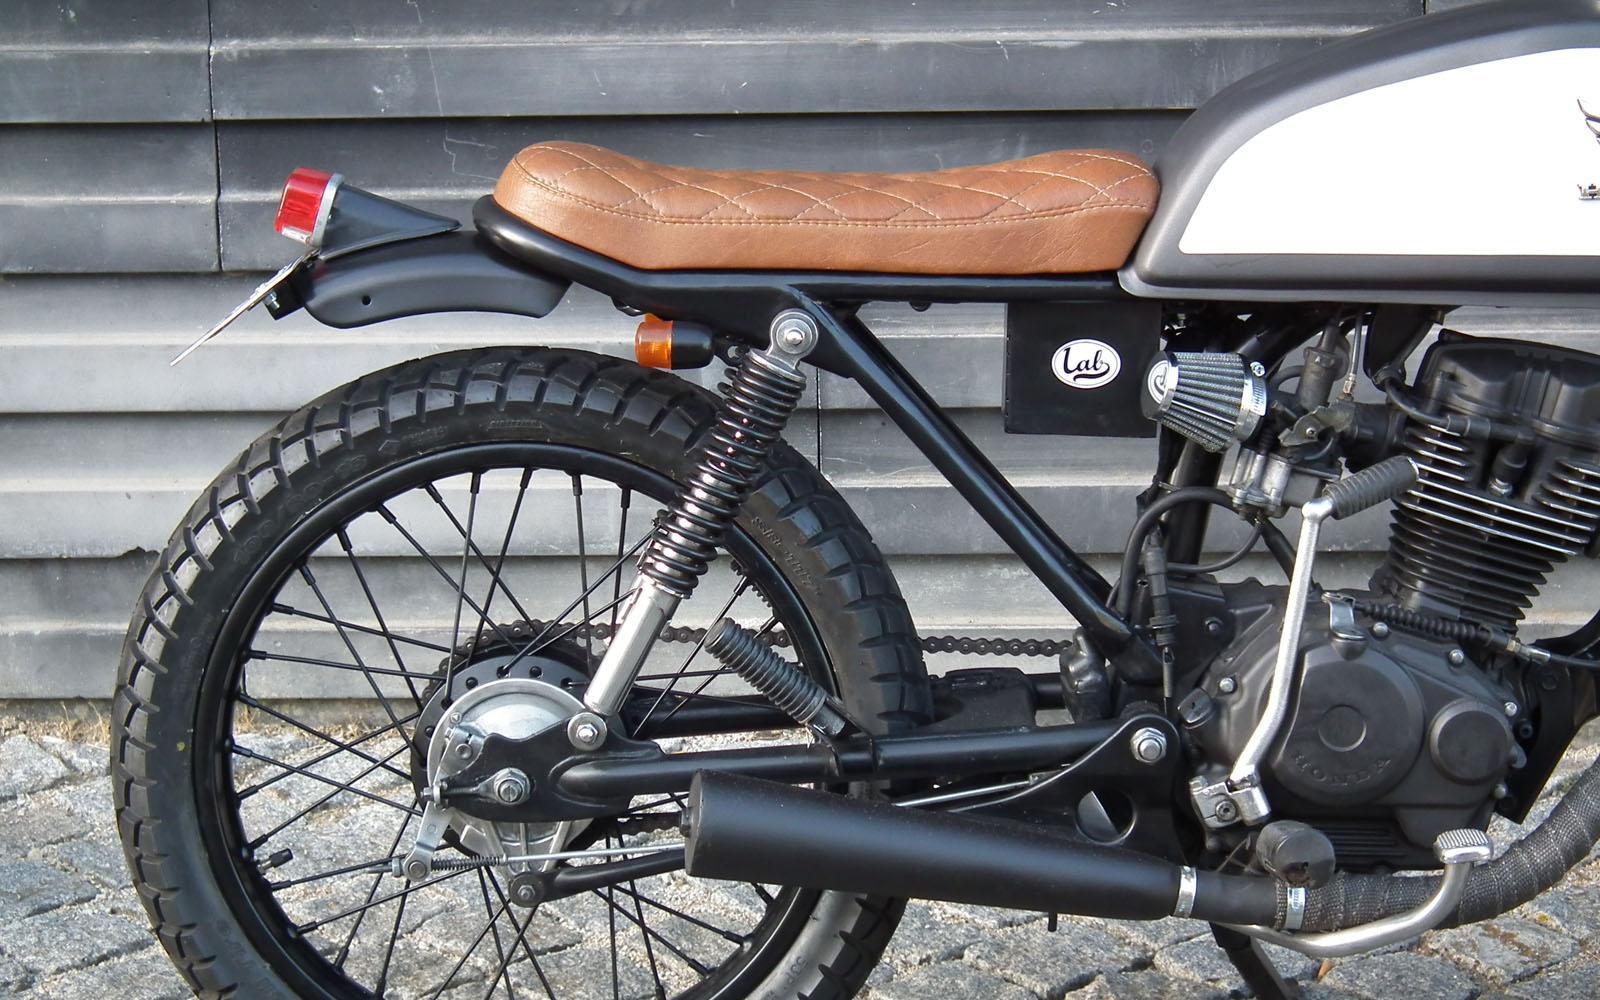 Lab 42 Labmotorcycle